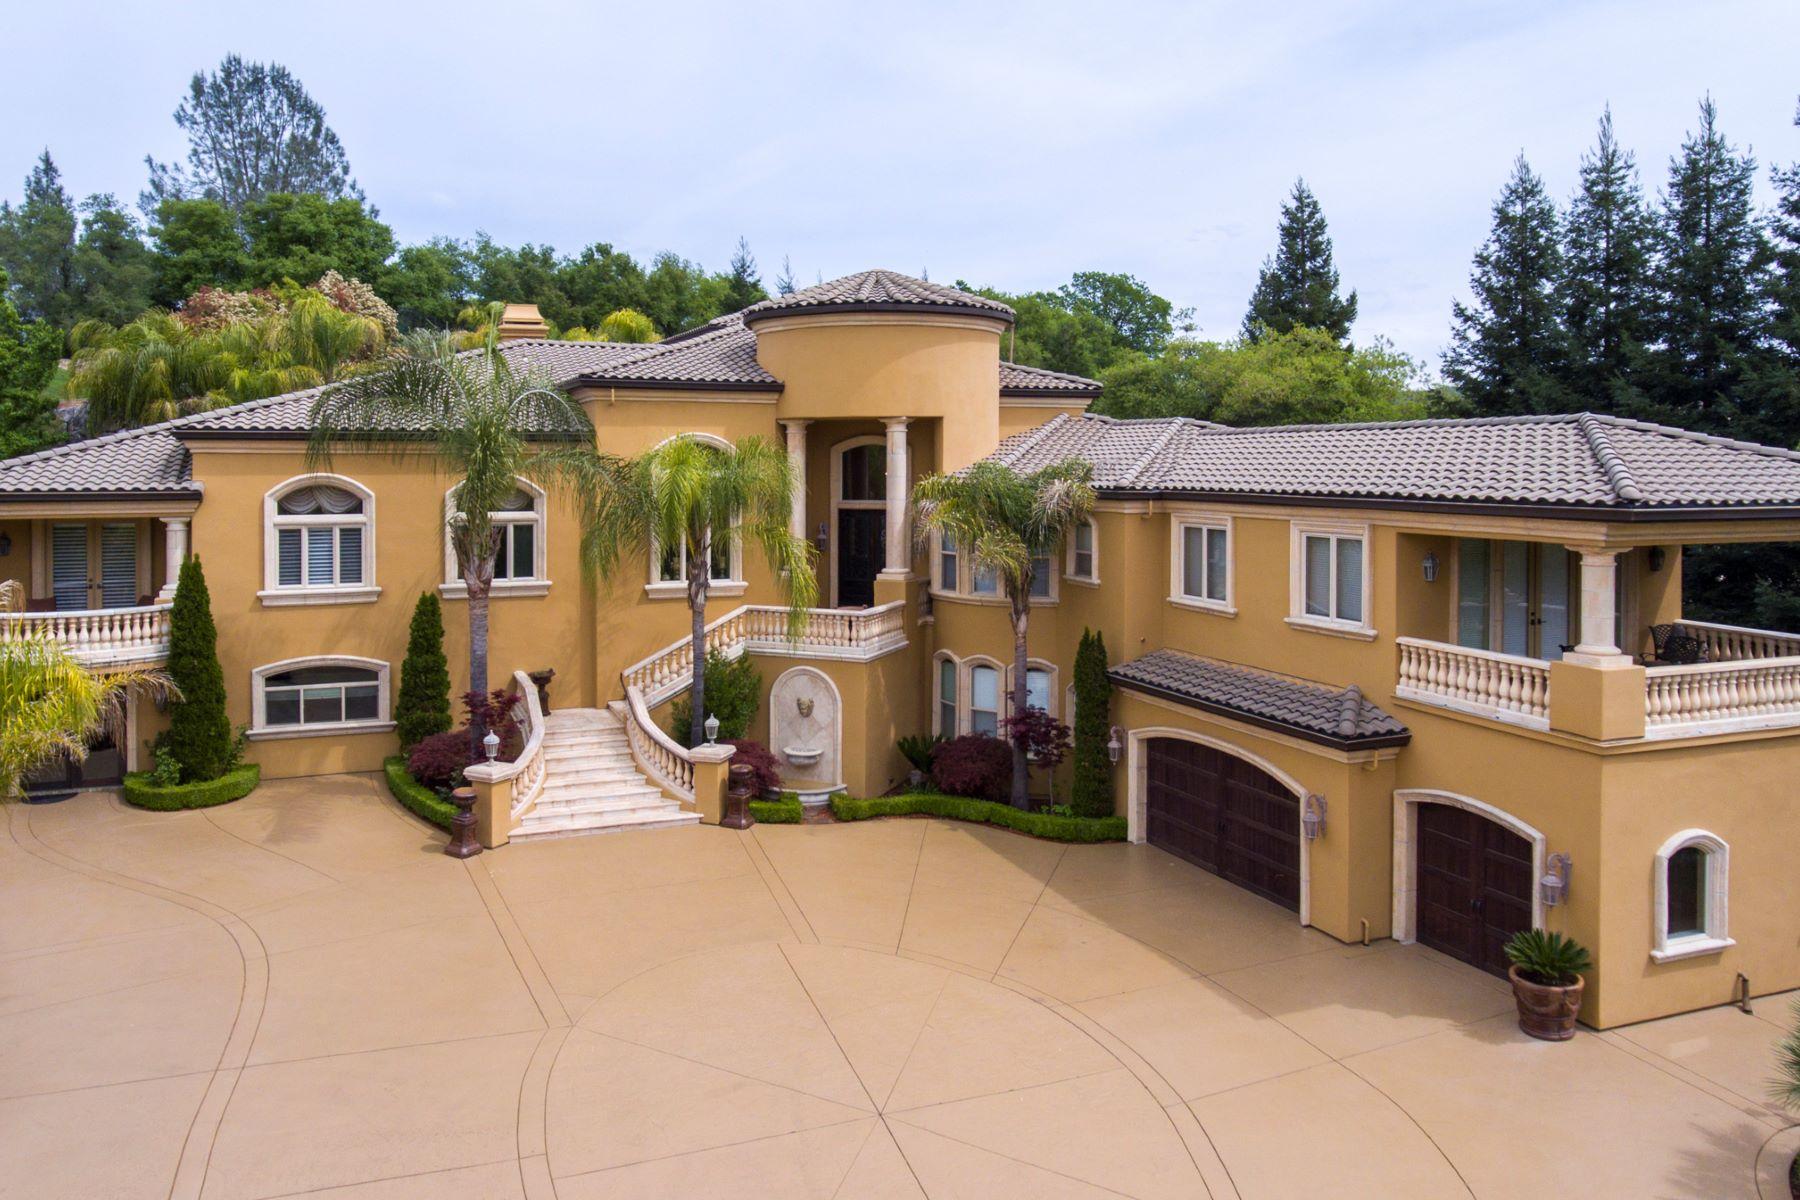 Single Family Homes for Sale at 6005 Vía Alicante, Granite Bay, CA 95746 6005 Vía Alicante Granite Bay, California 95746 United States